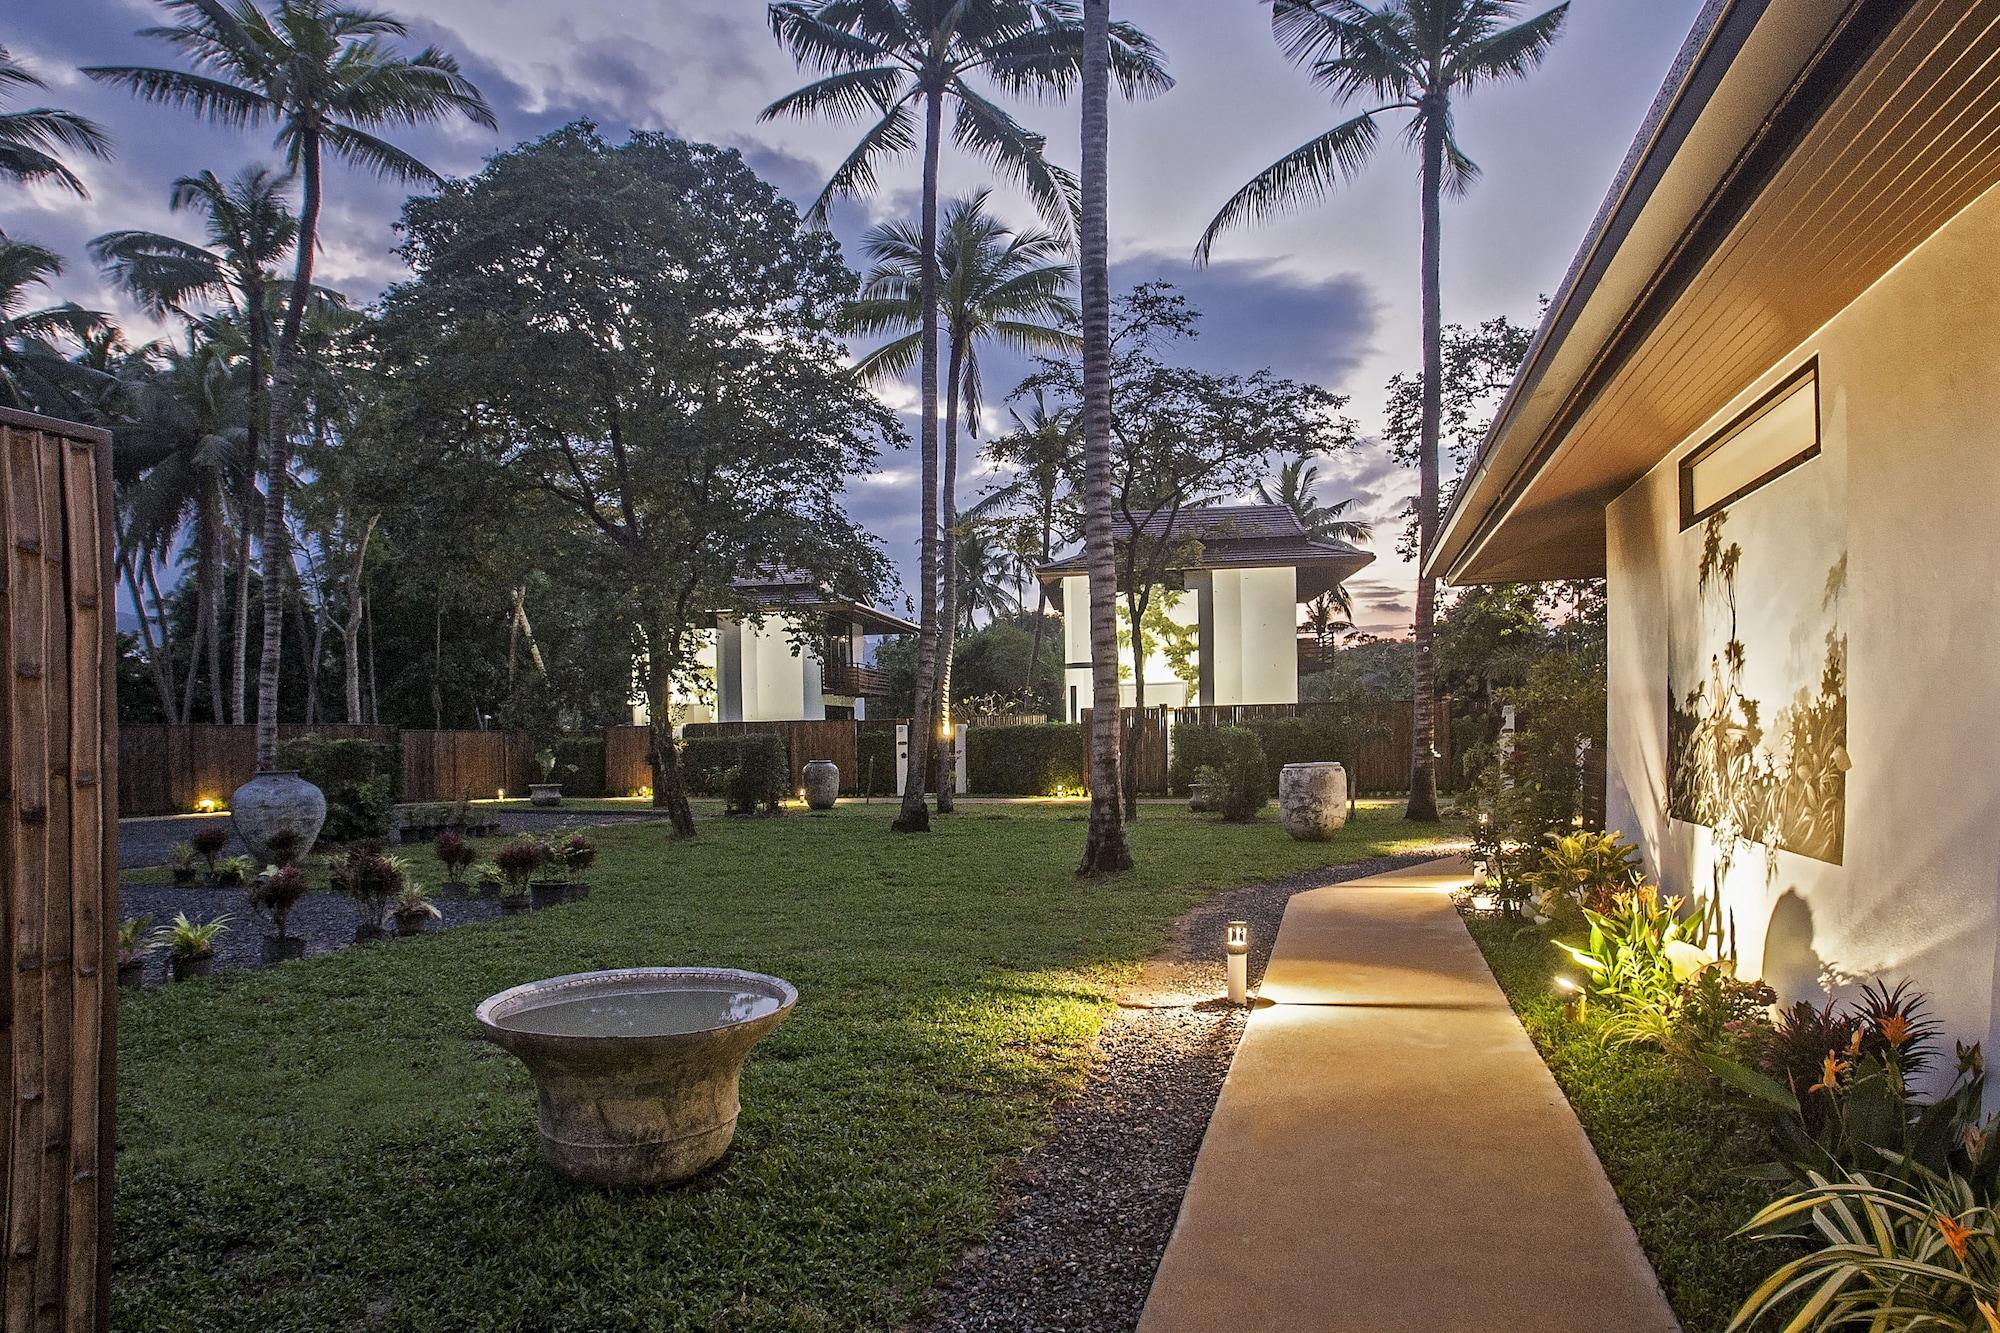 Khwan Beach Resort - Pool Villas and Glamping - Adults Only, Ko Samui